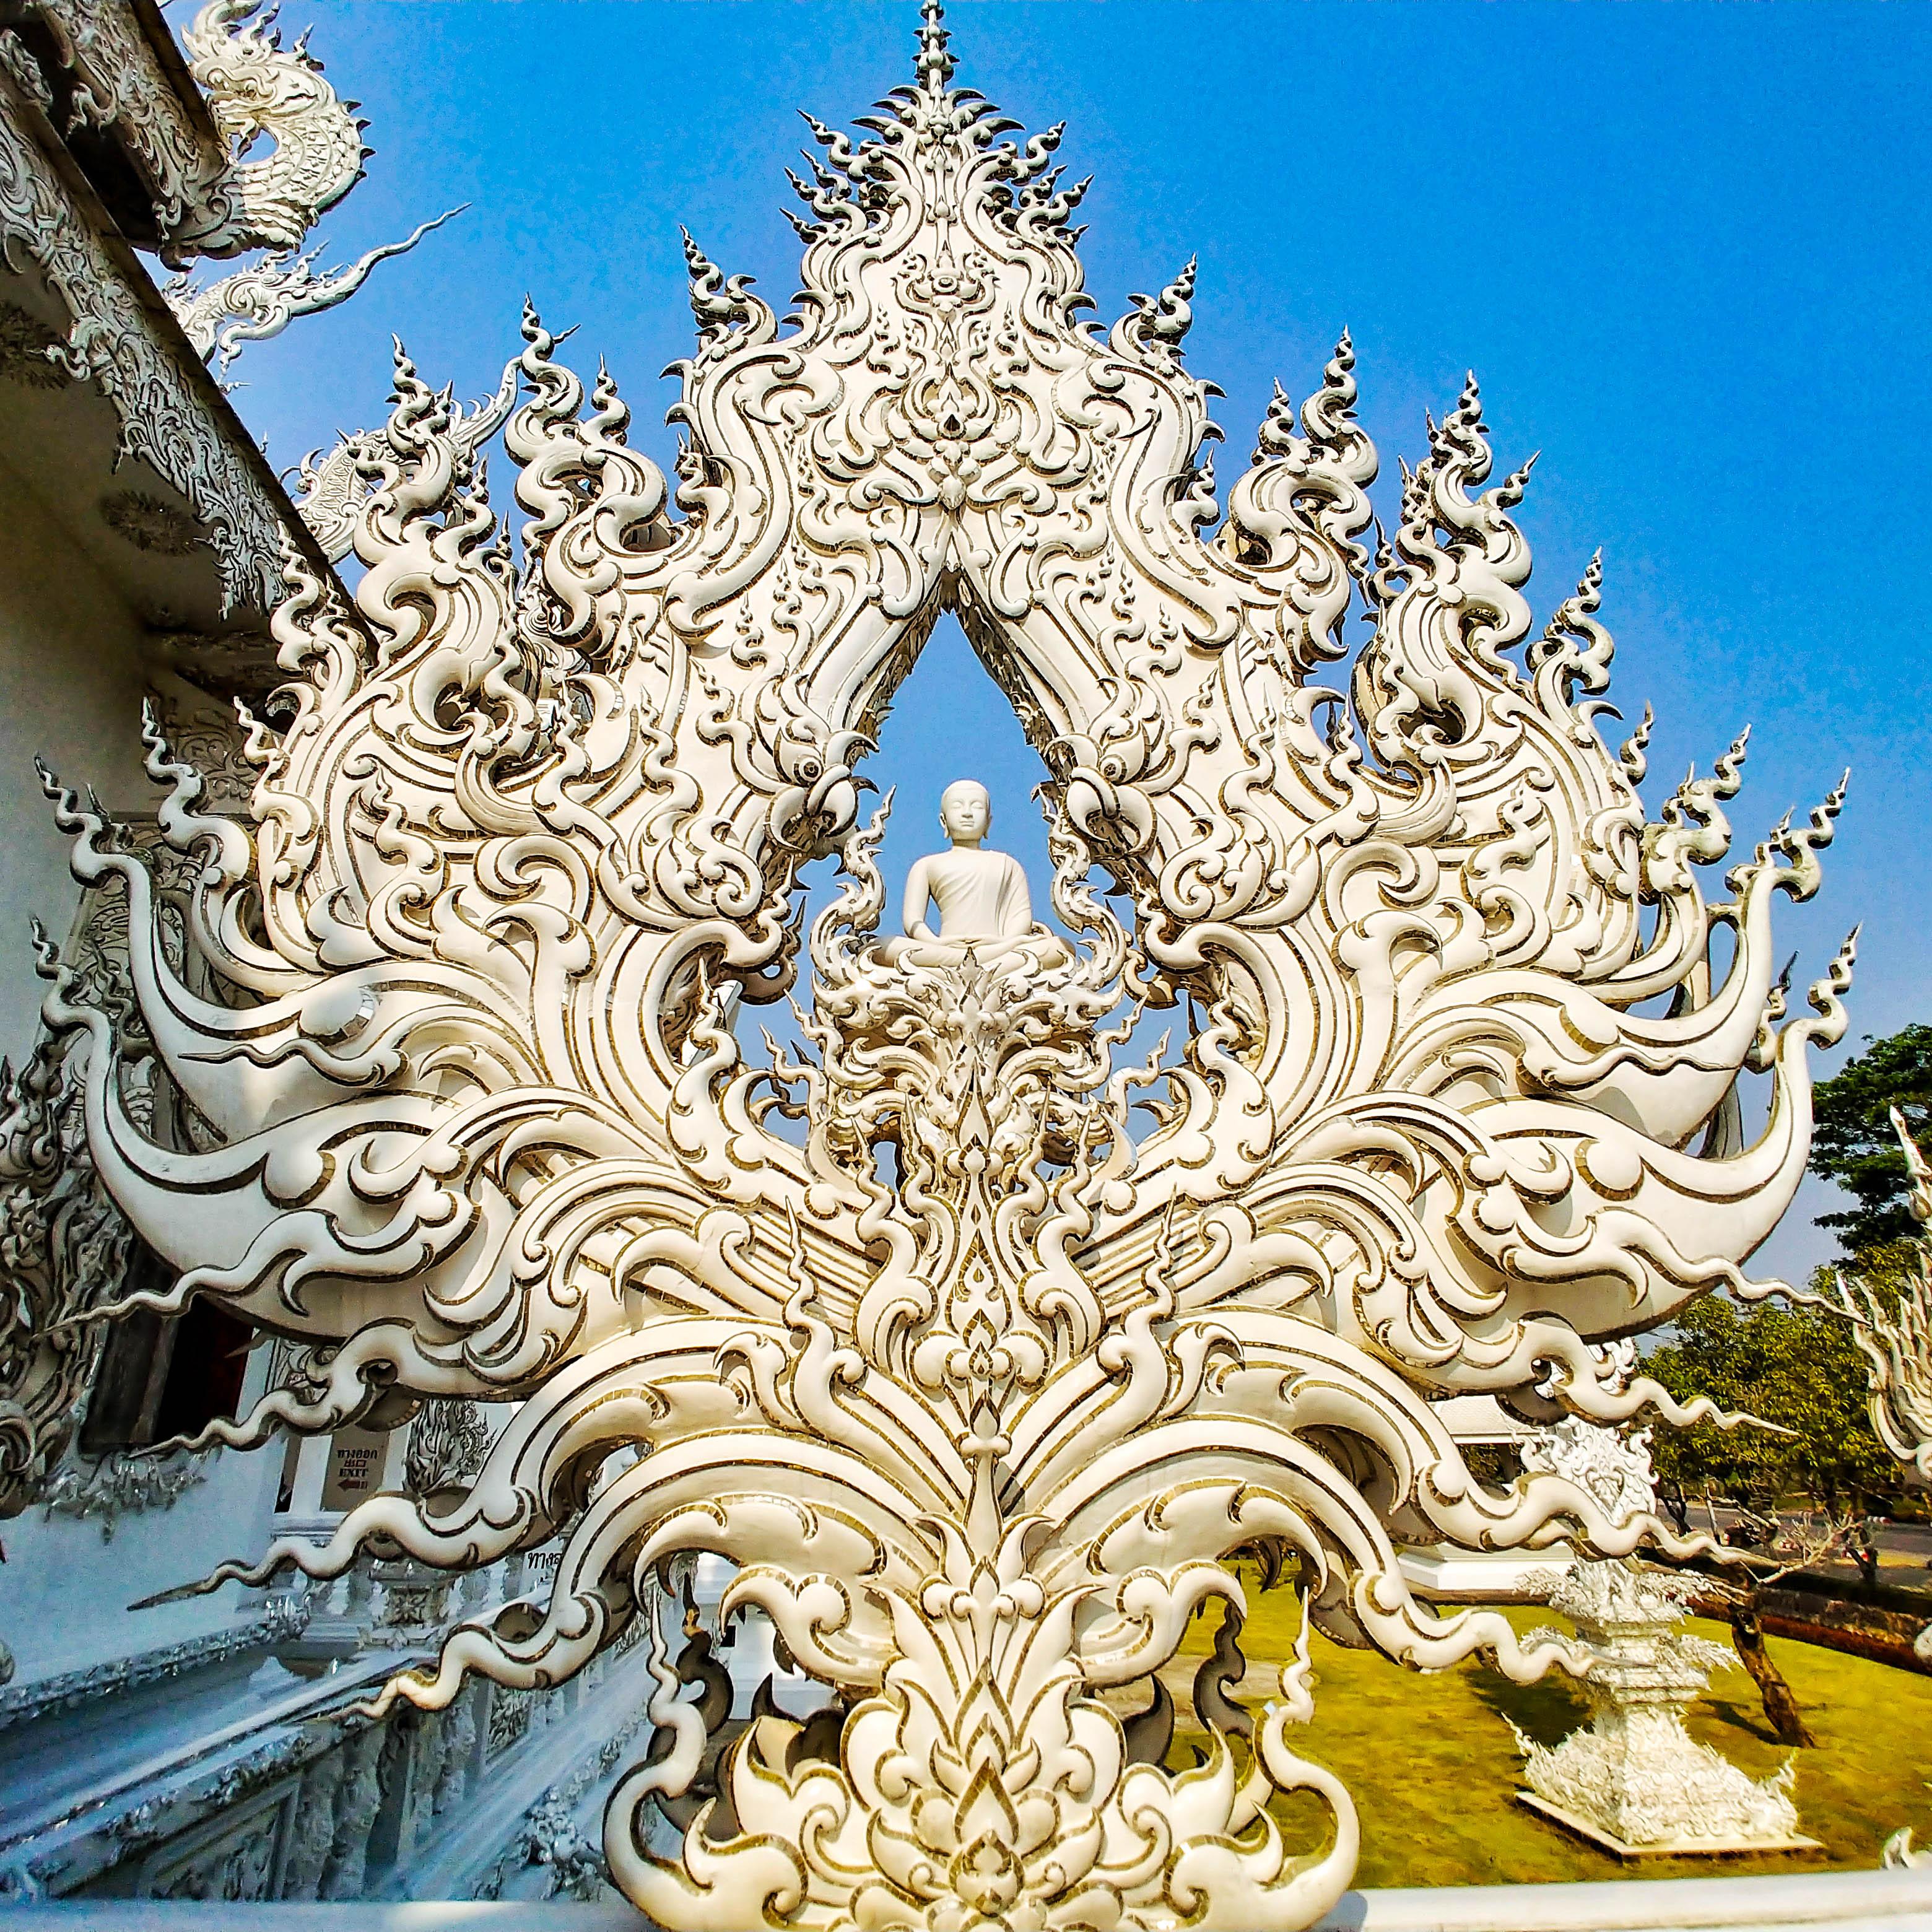 Wat Rong Khun Biała Świątynia w Tajlandii